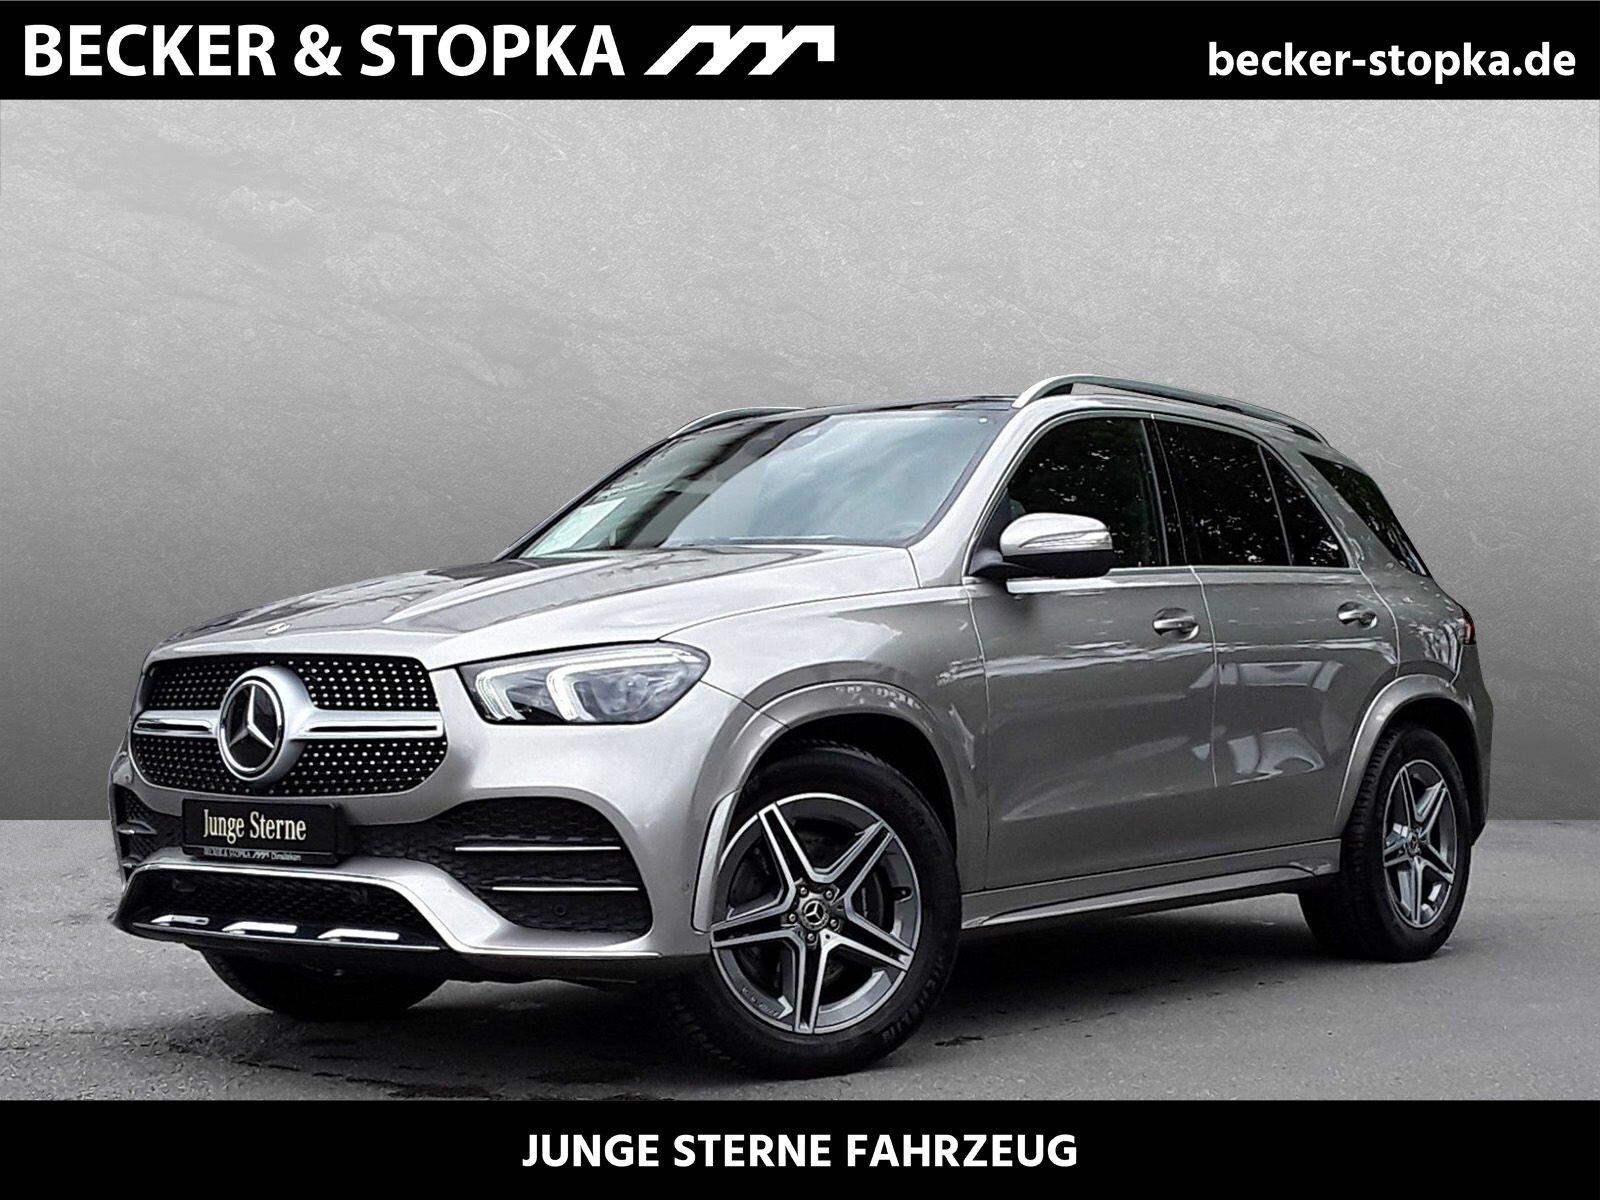 Mercedes-Benz GLE 300 d AMG Mulitb*Ambi*AHK*Pano*EasyPk*Distro, Jahr 2020, Diesel